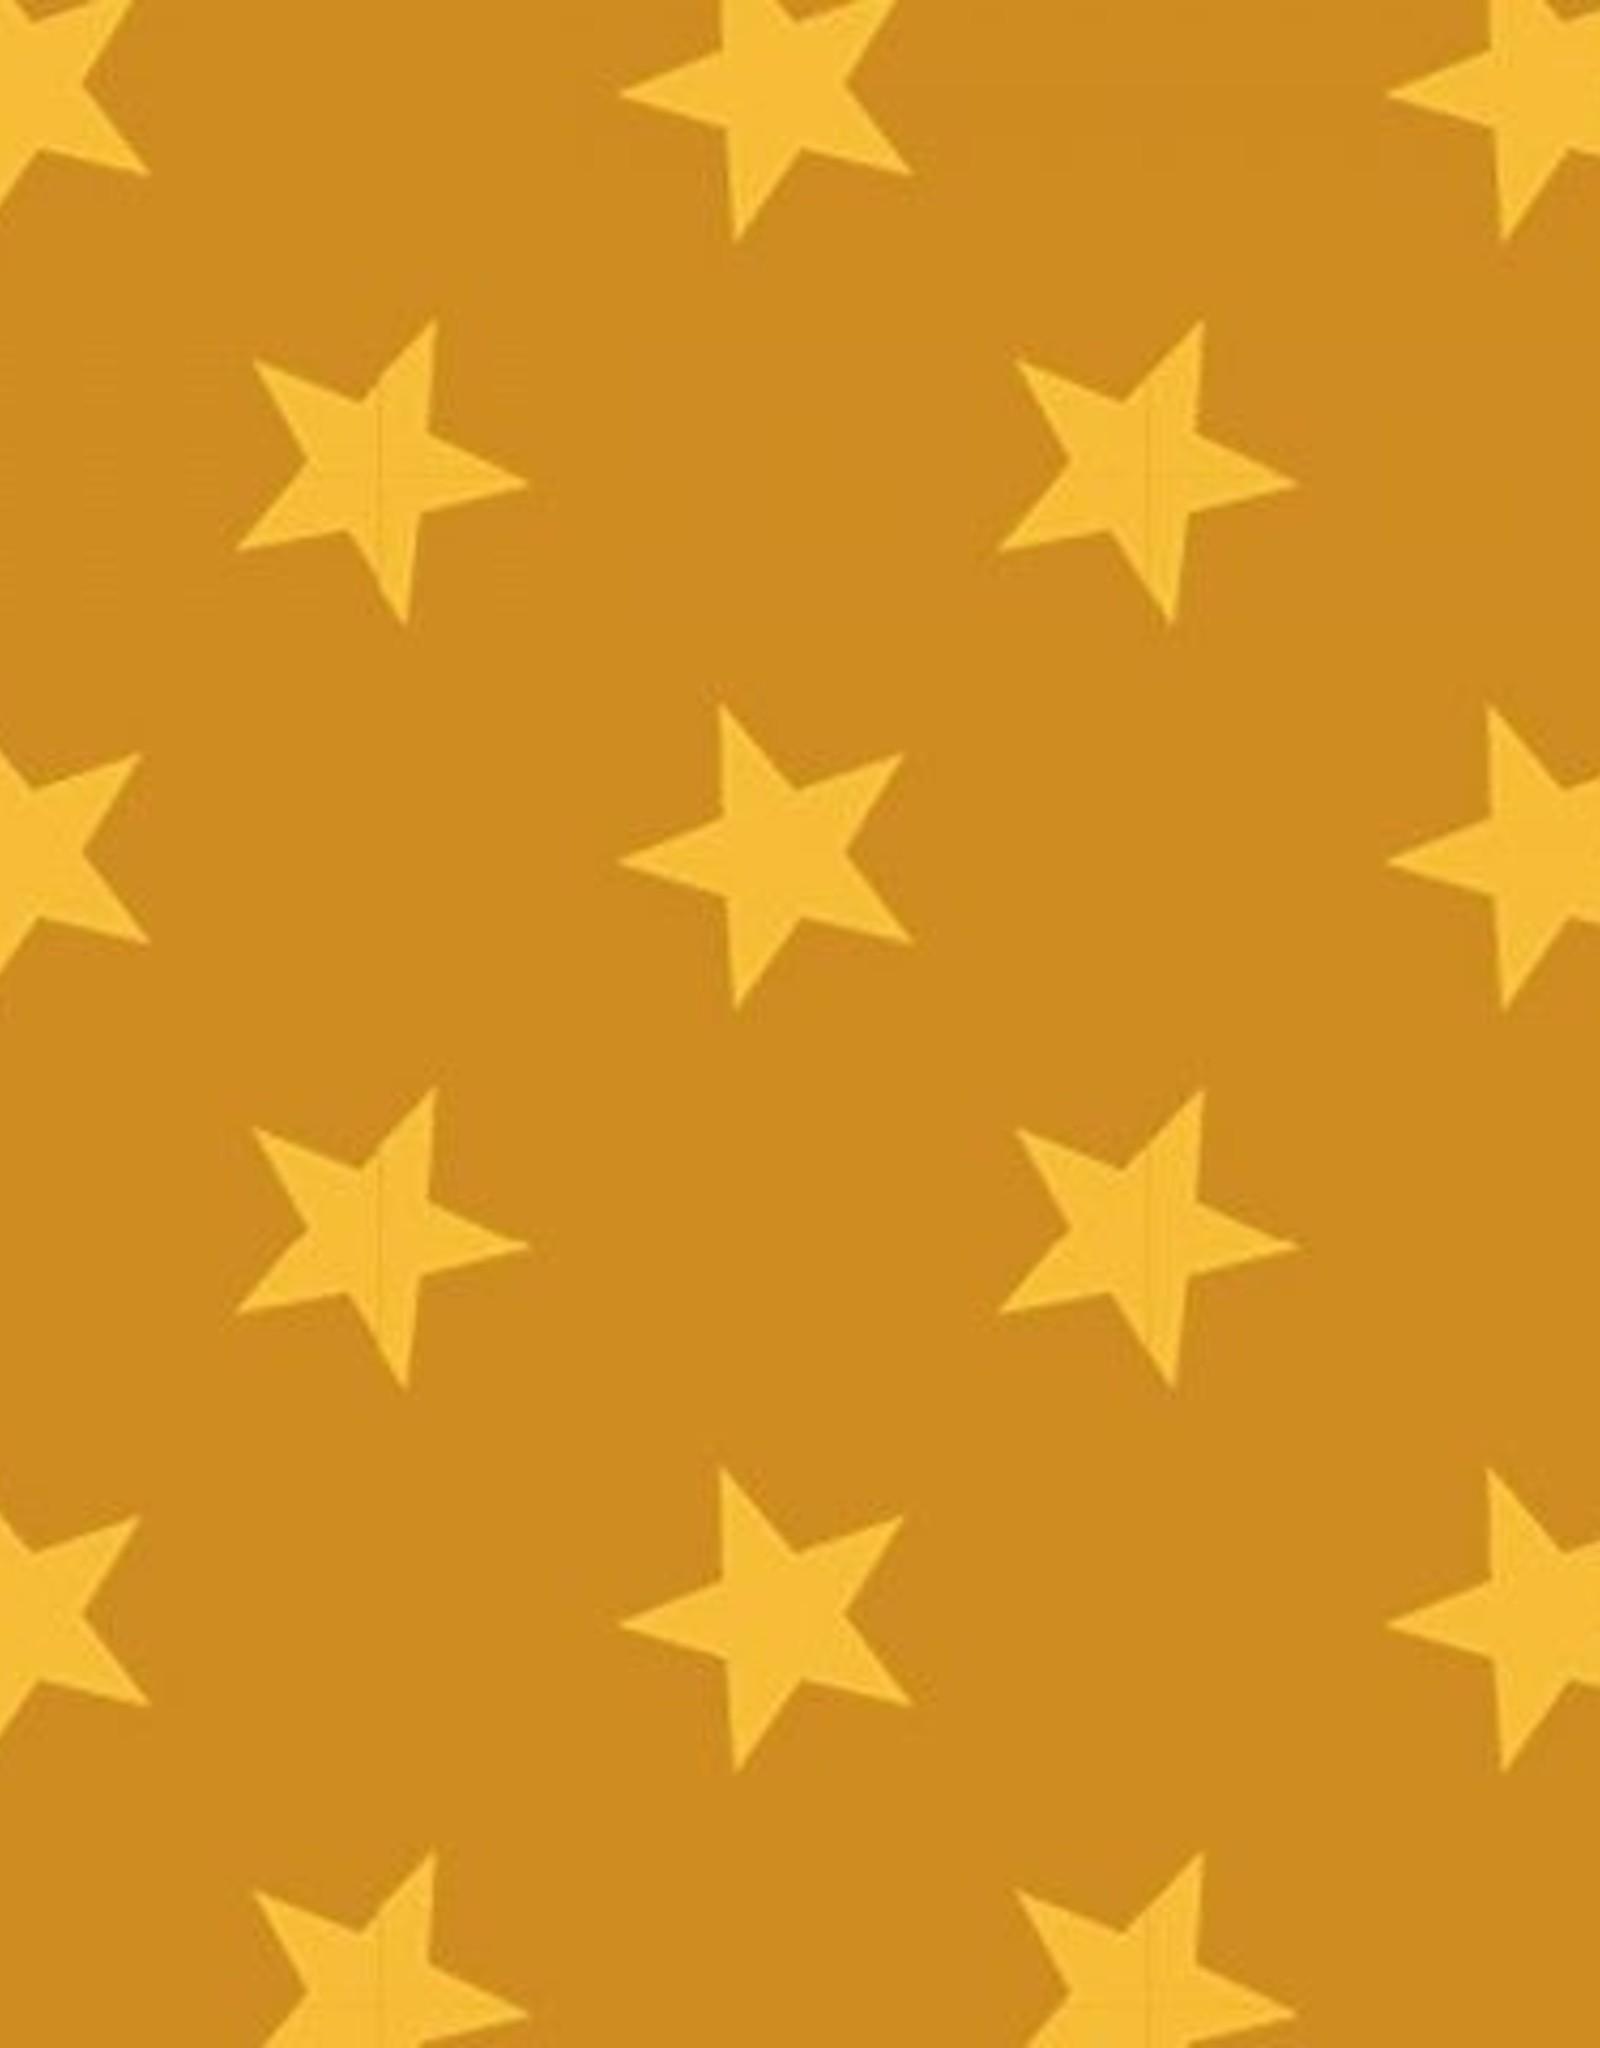 Mosterd met gele sterretjes French terry